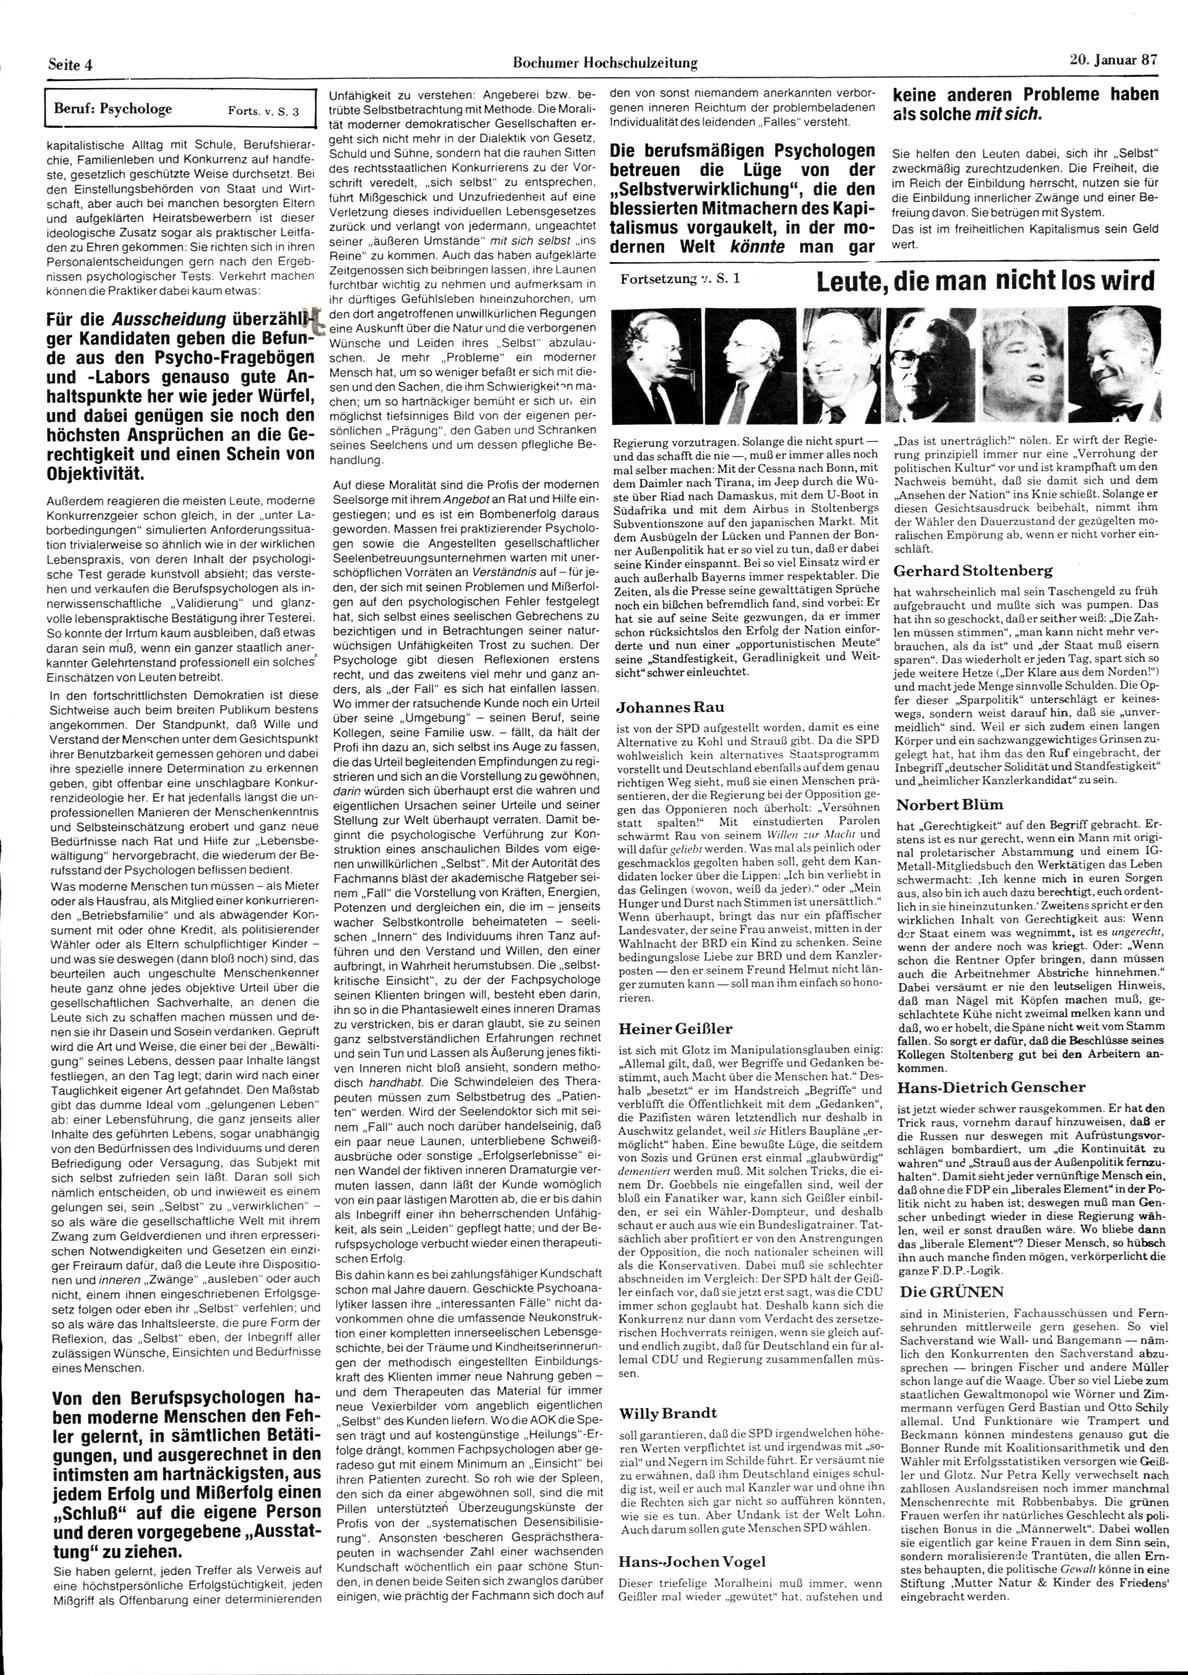 Bochum_BHZ_19870120_144_004